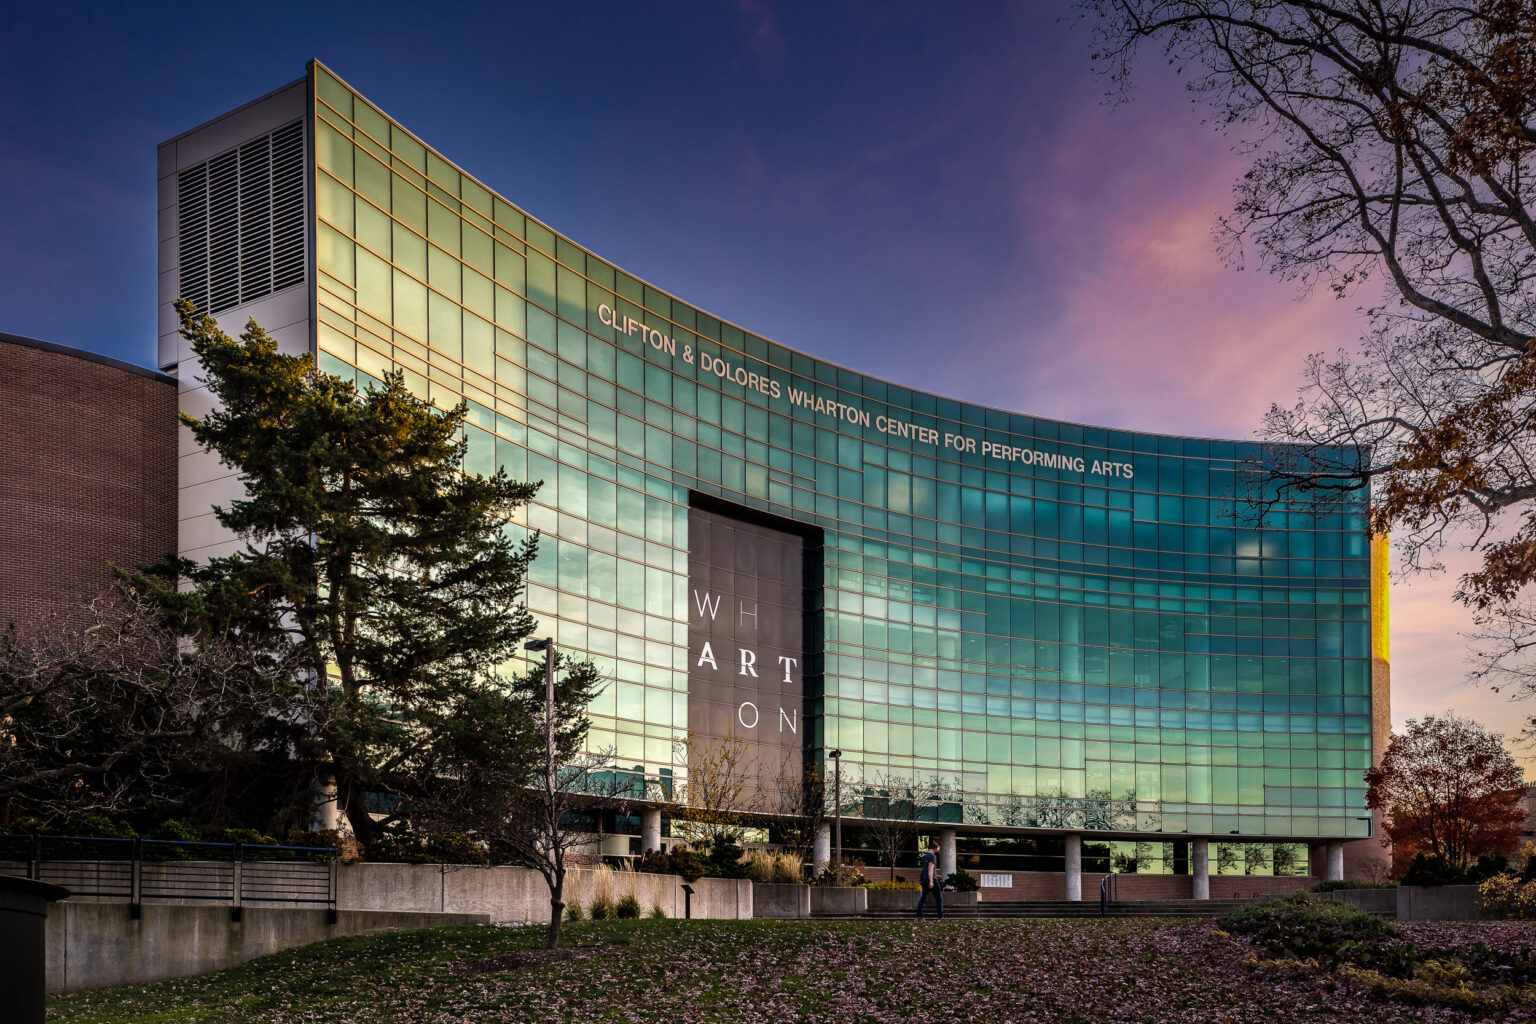 Wharton Center for the Performing Arts